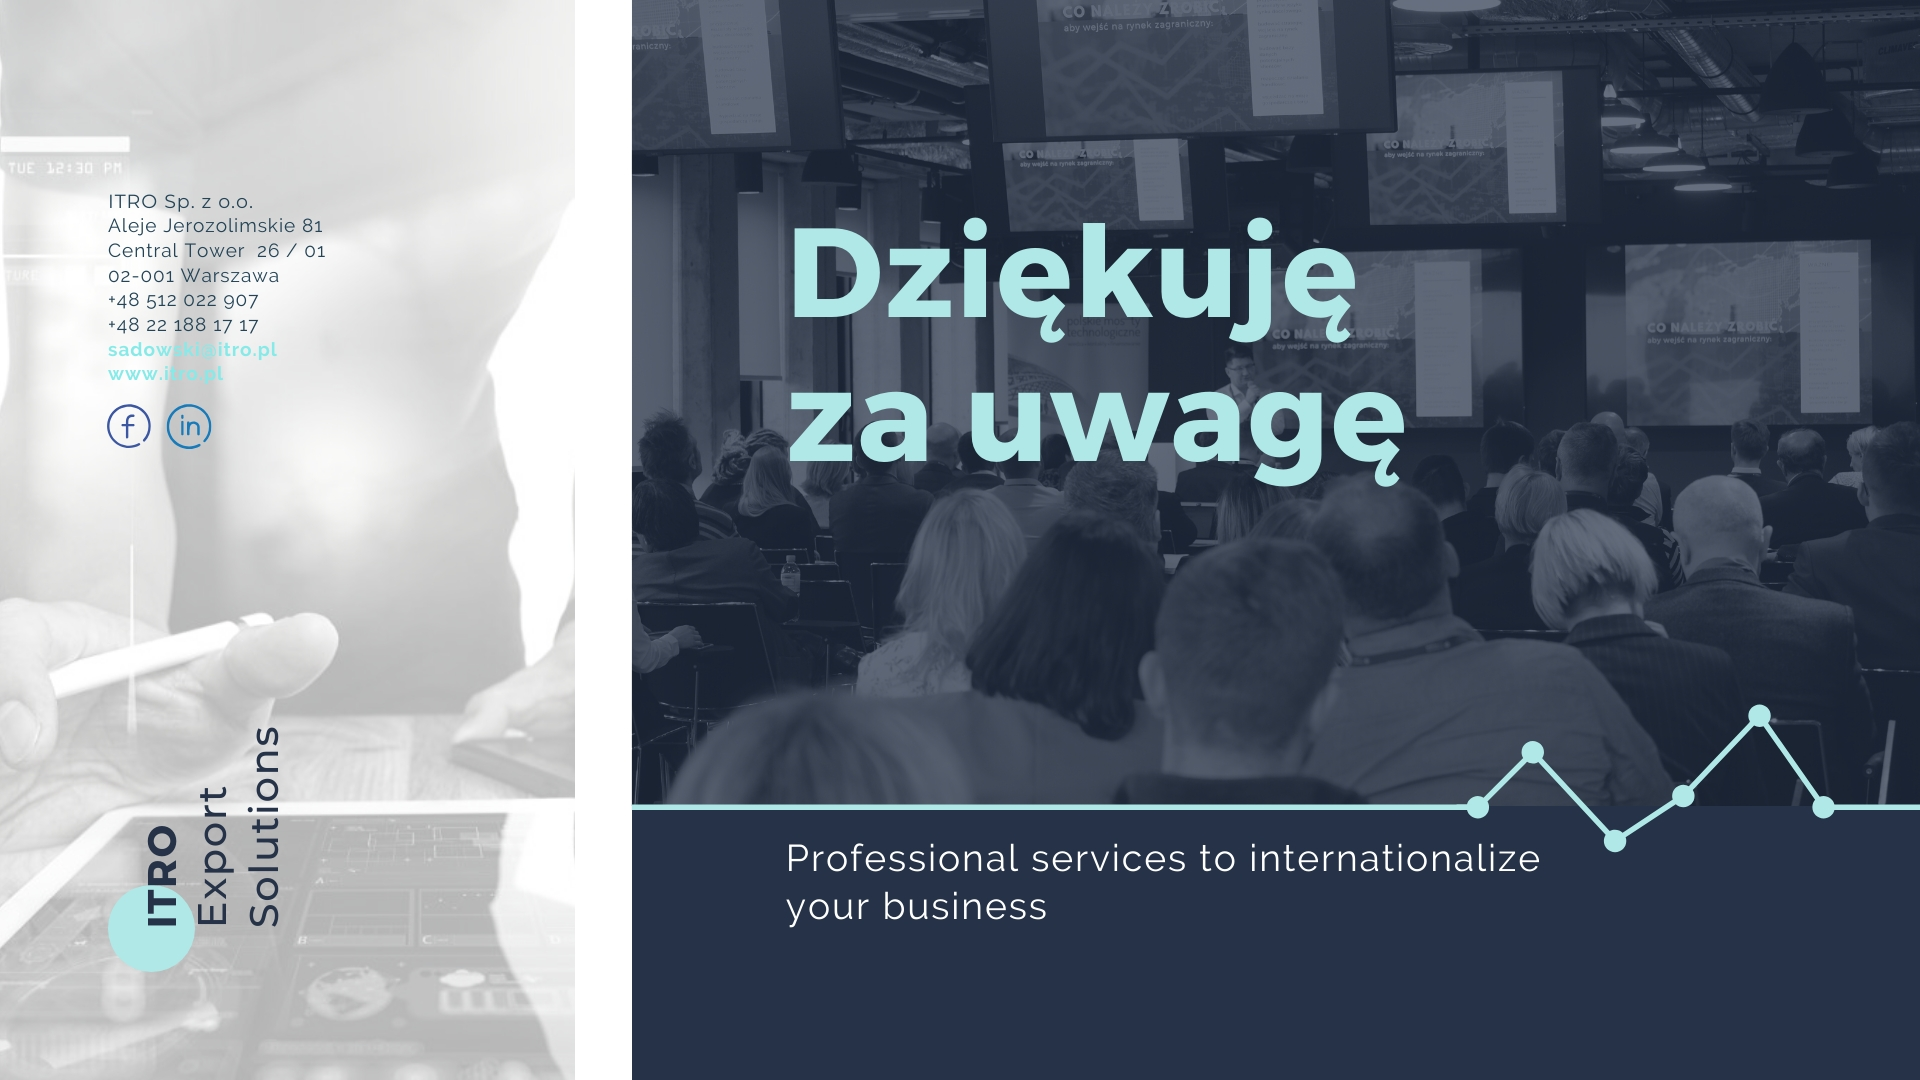 14_Professionalservicestointernationalizeyourbusiness_by ITRO_2020